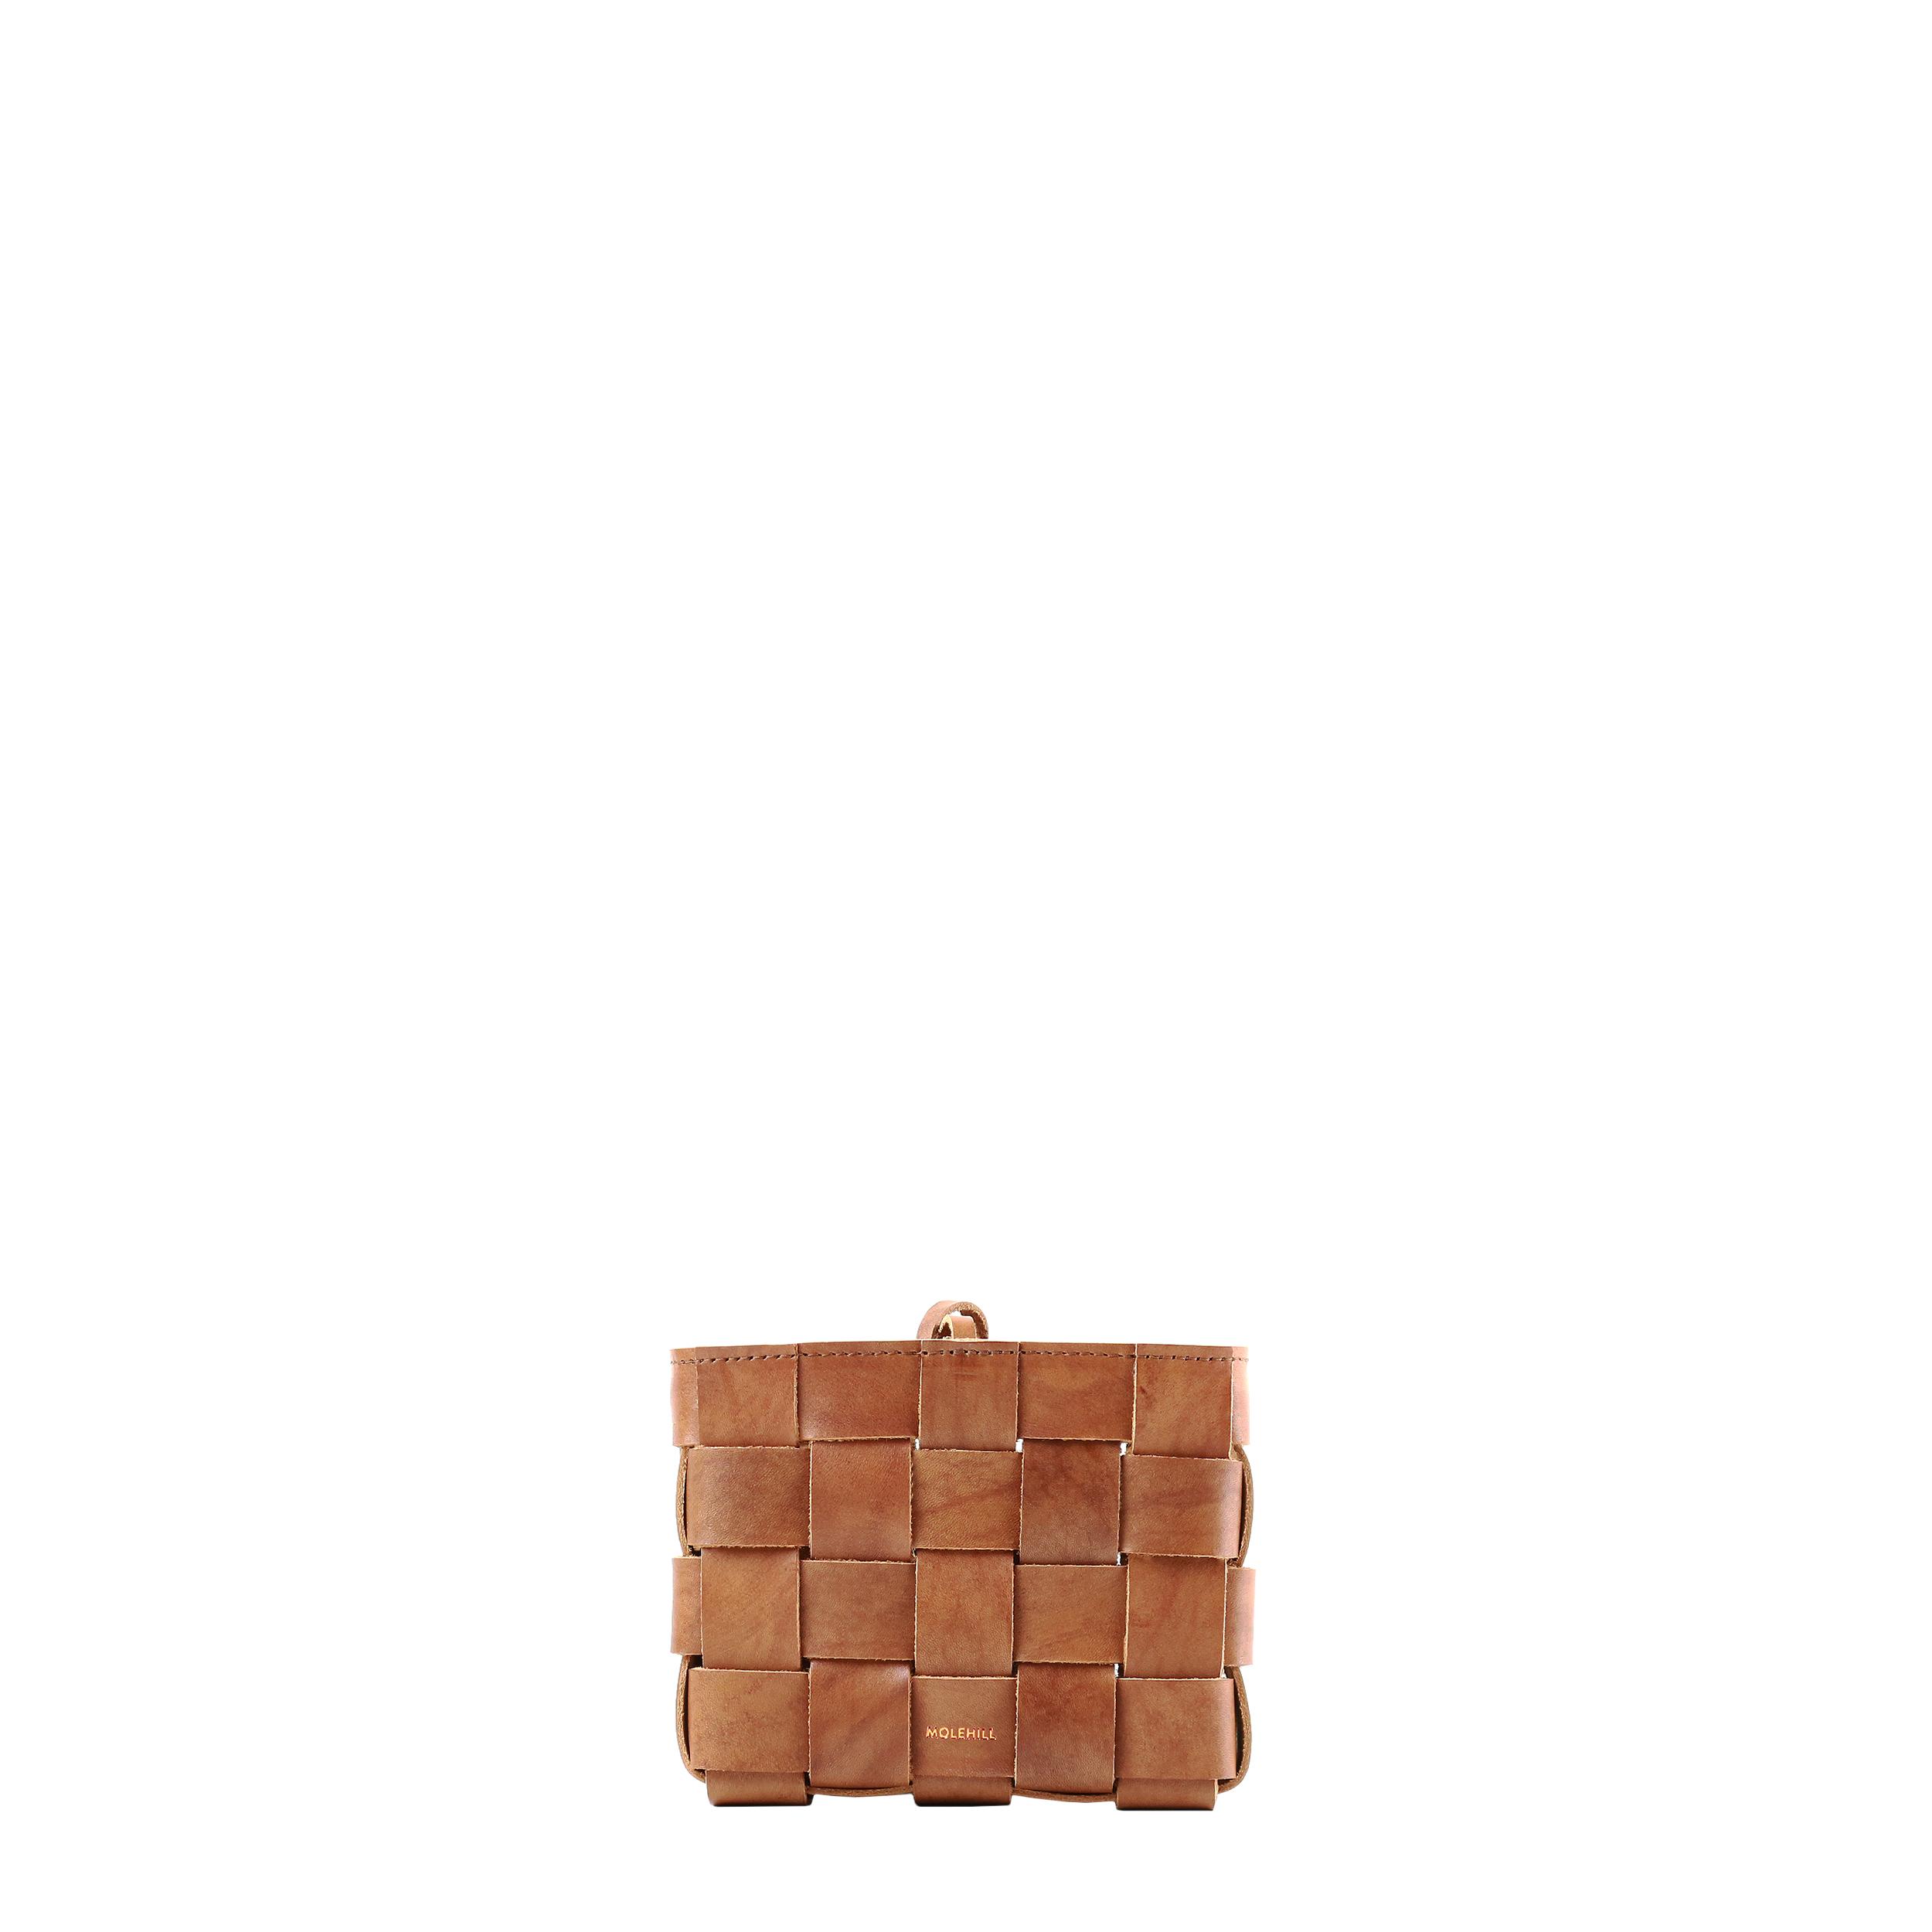 Pane Mini Crossbody Woven Bag Wild-3